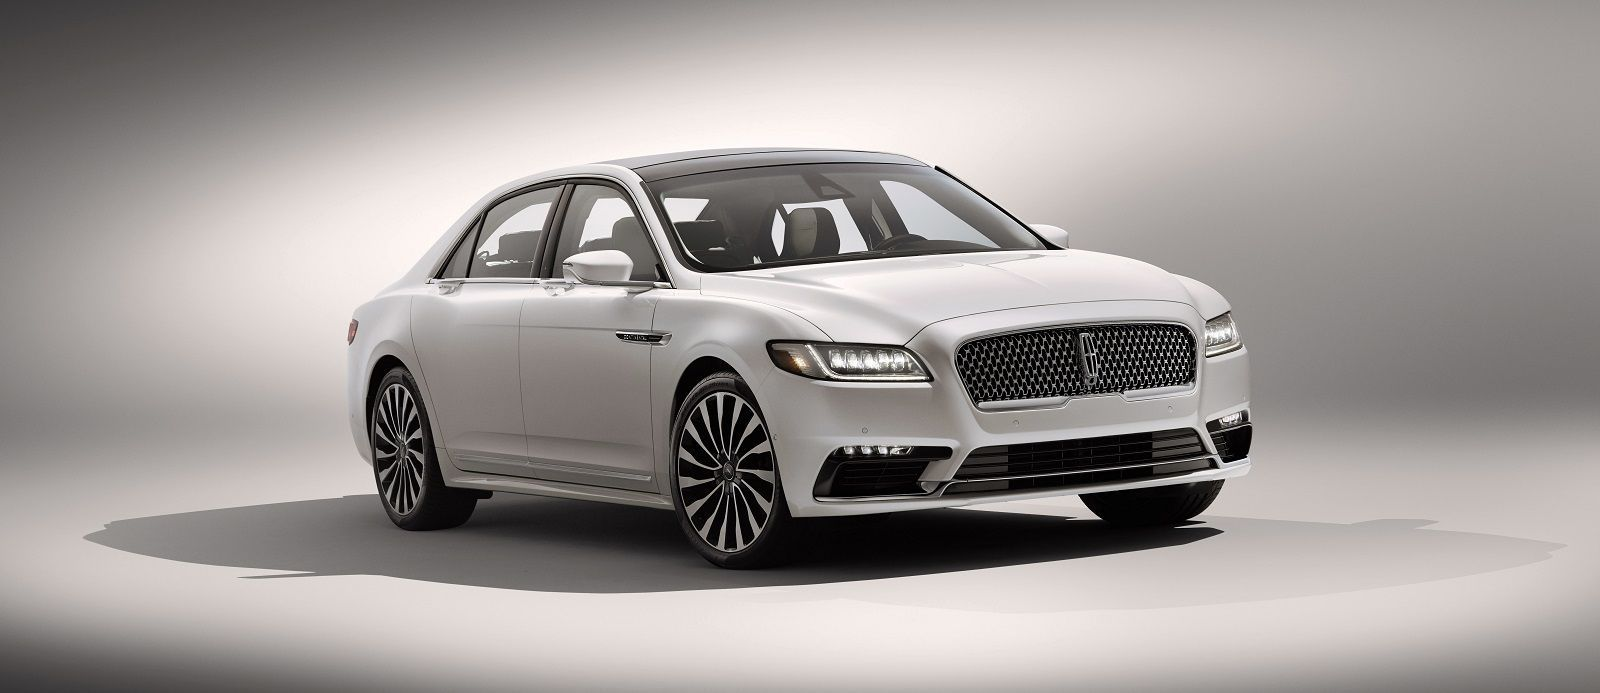 2017 Lincoln Continental | 2017 Lincoln Continental